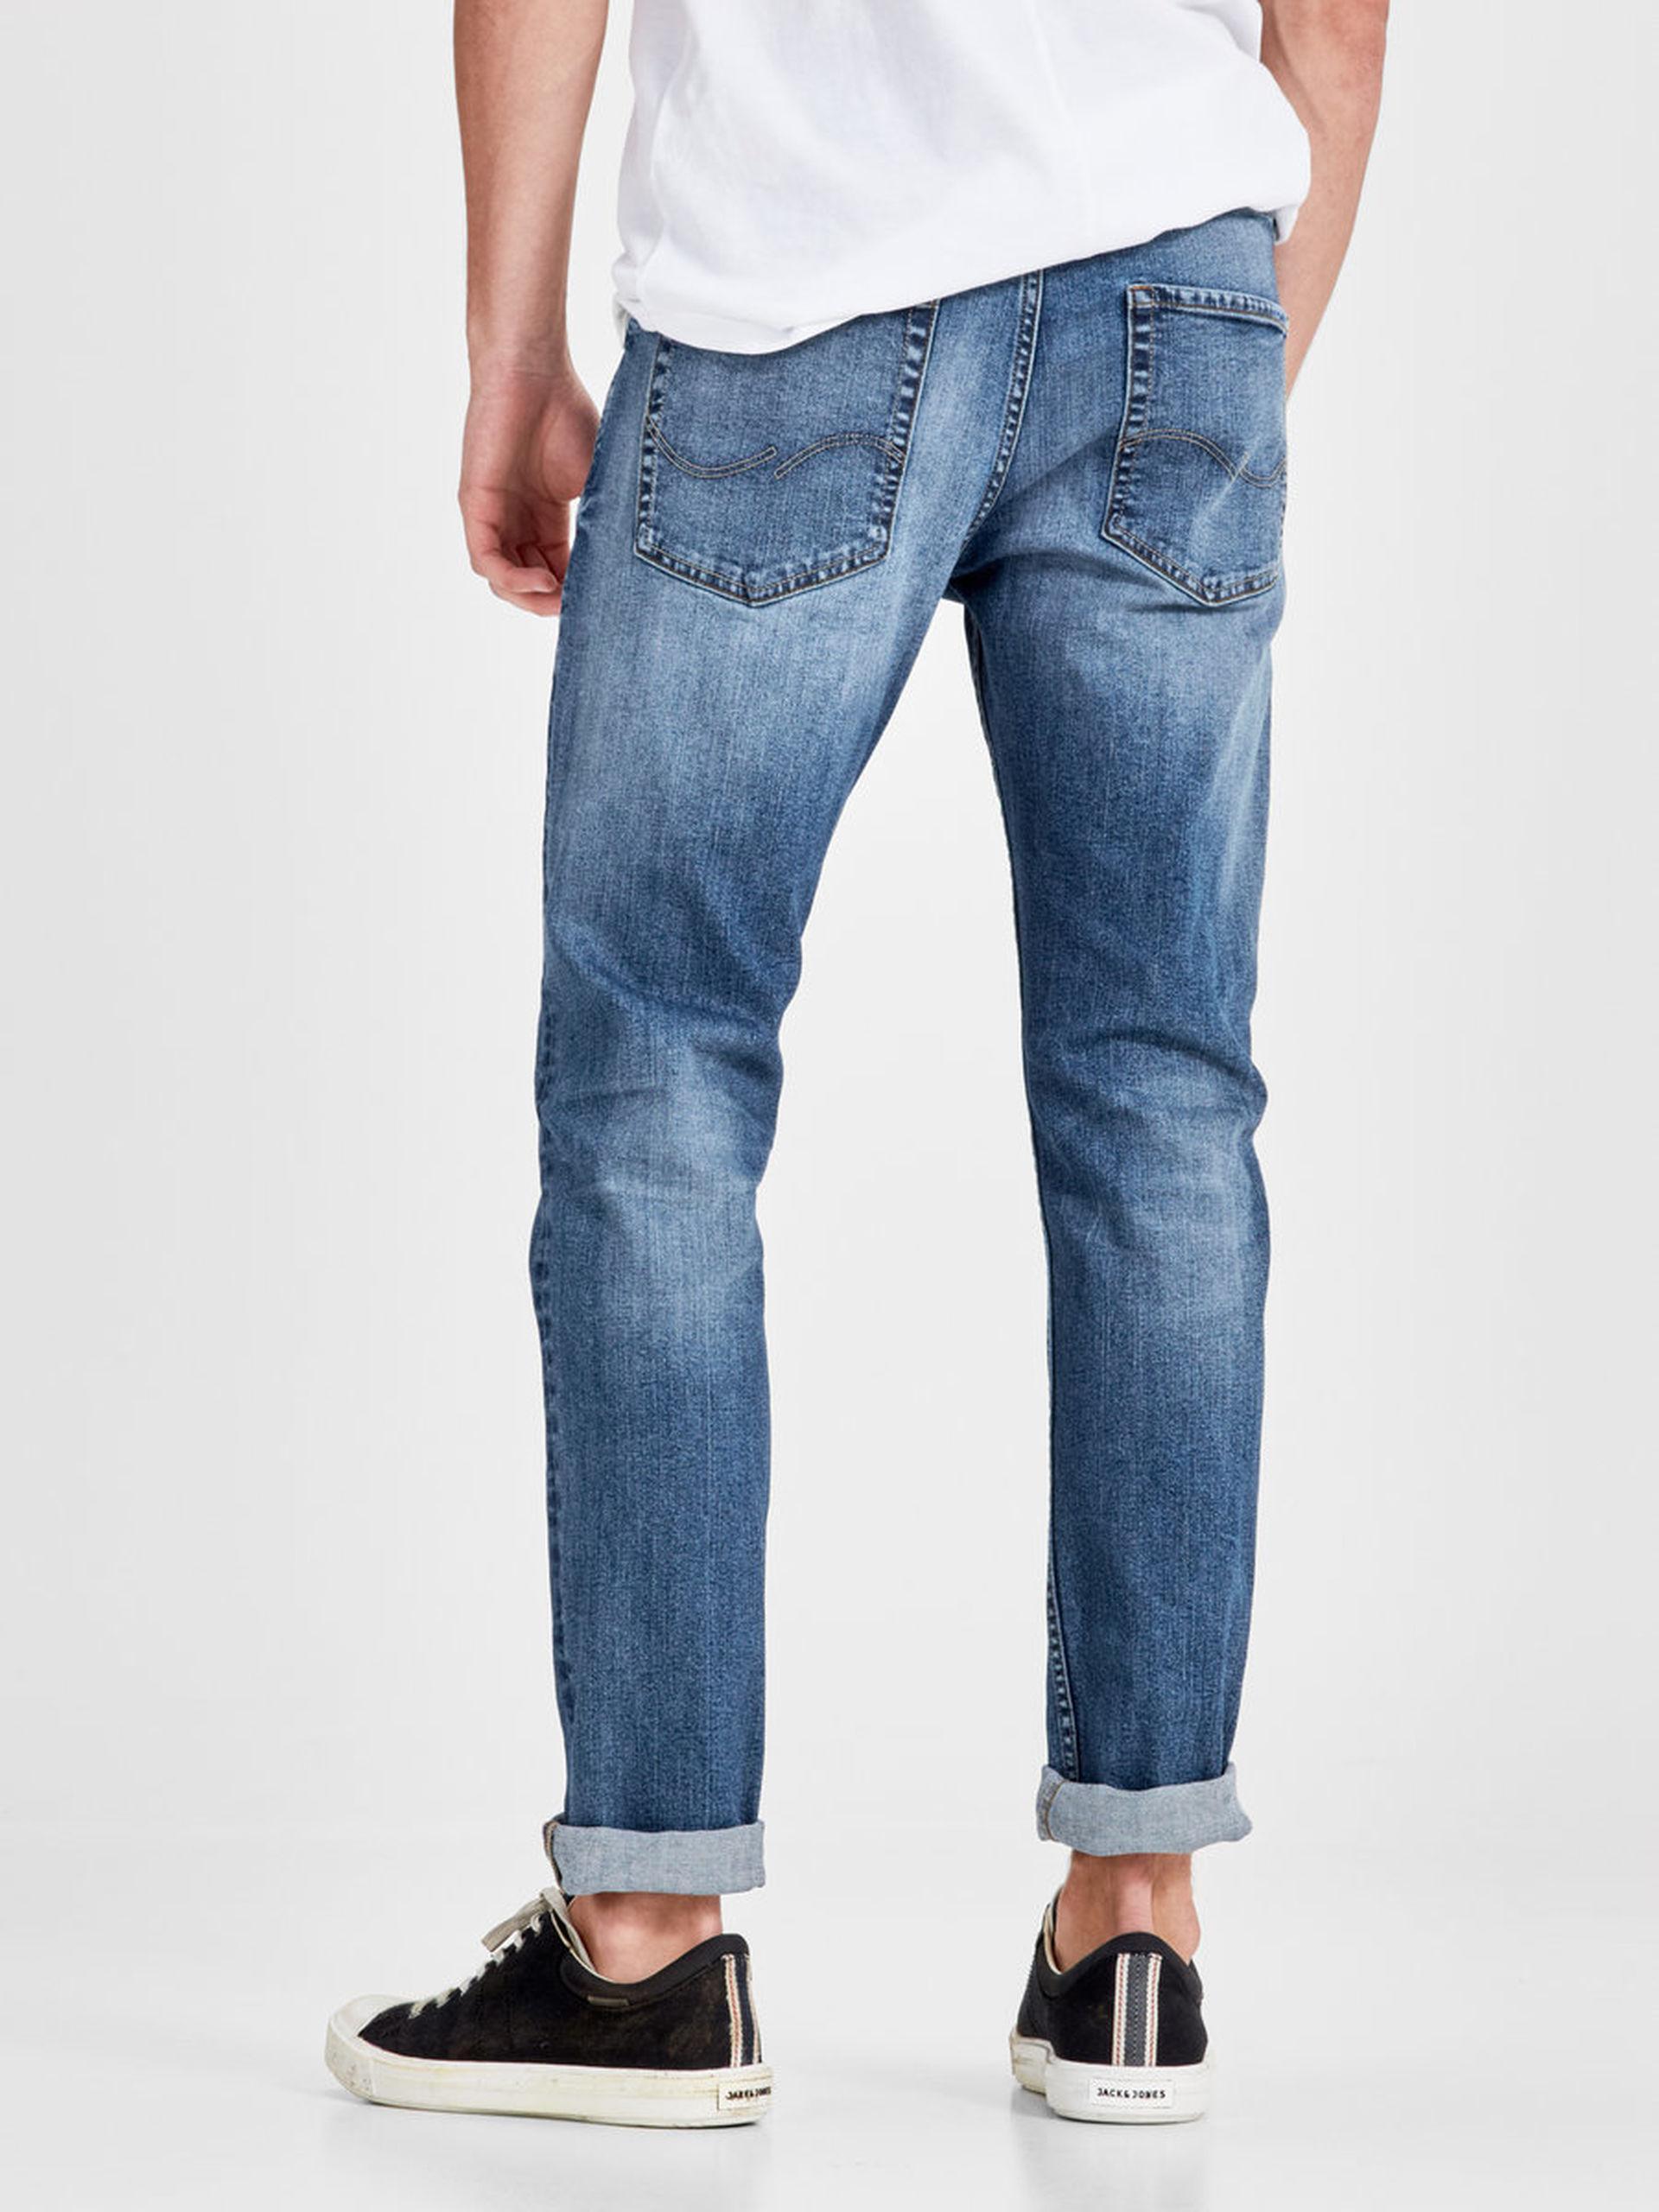 Jack & Jones 12104001 - Vaqueros Slim para hombre